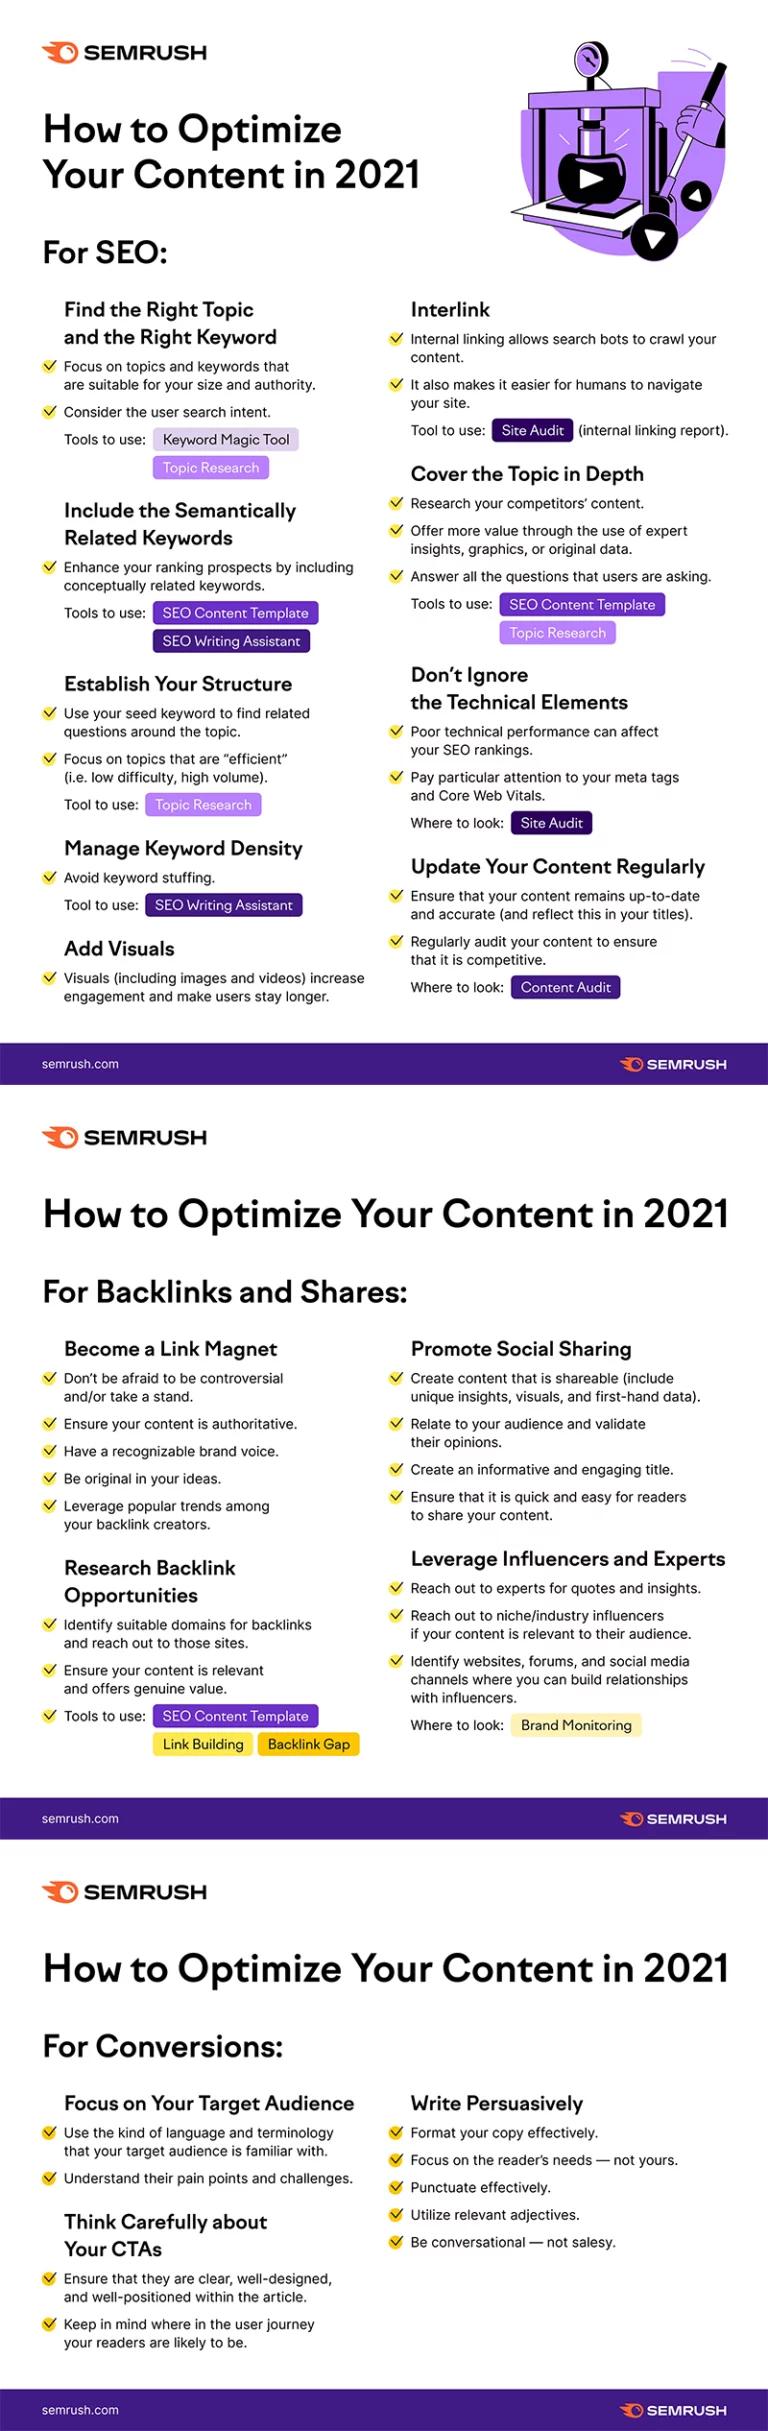 SEMRush content optimization guide